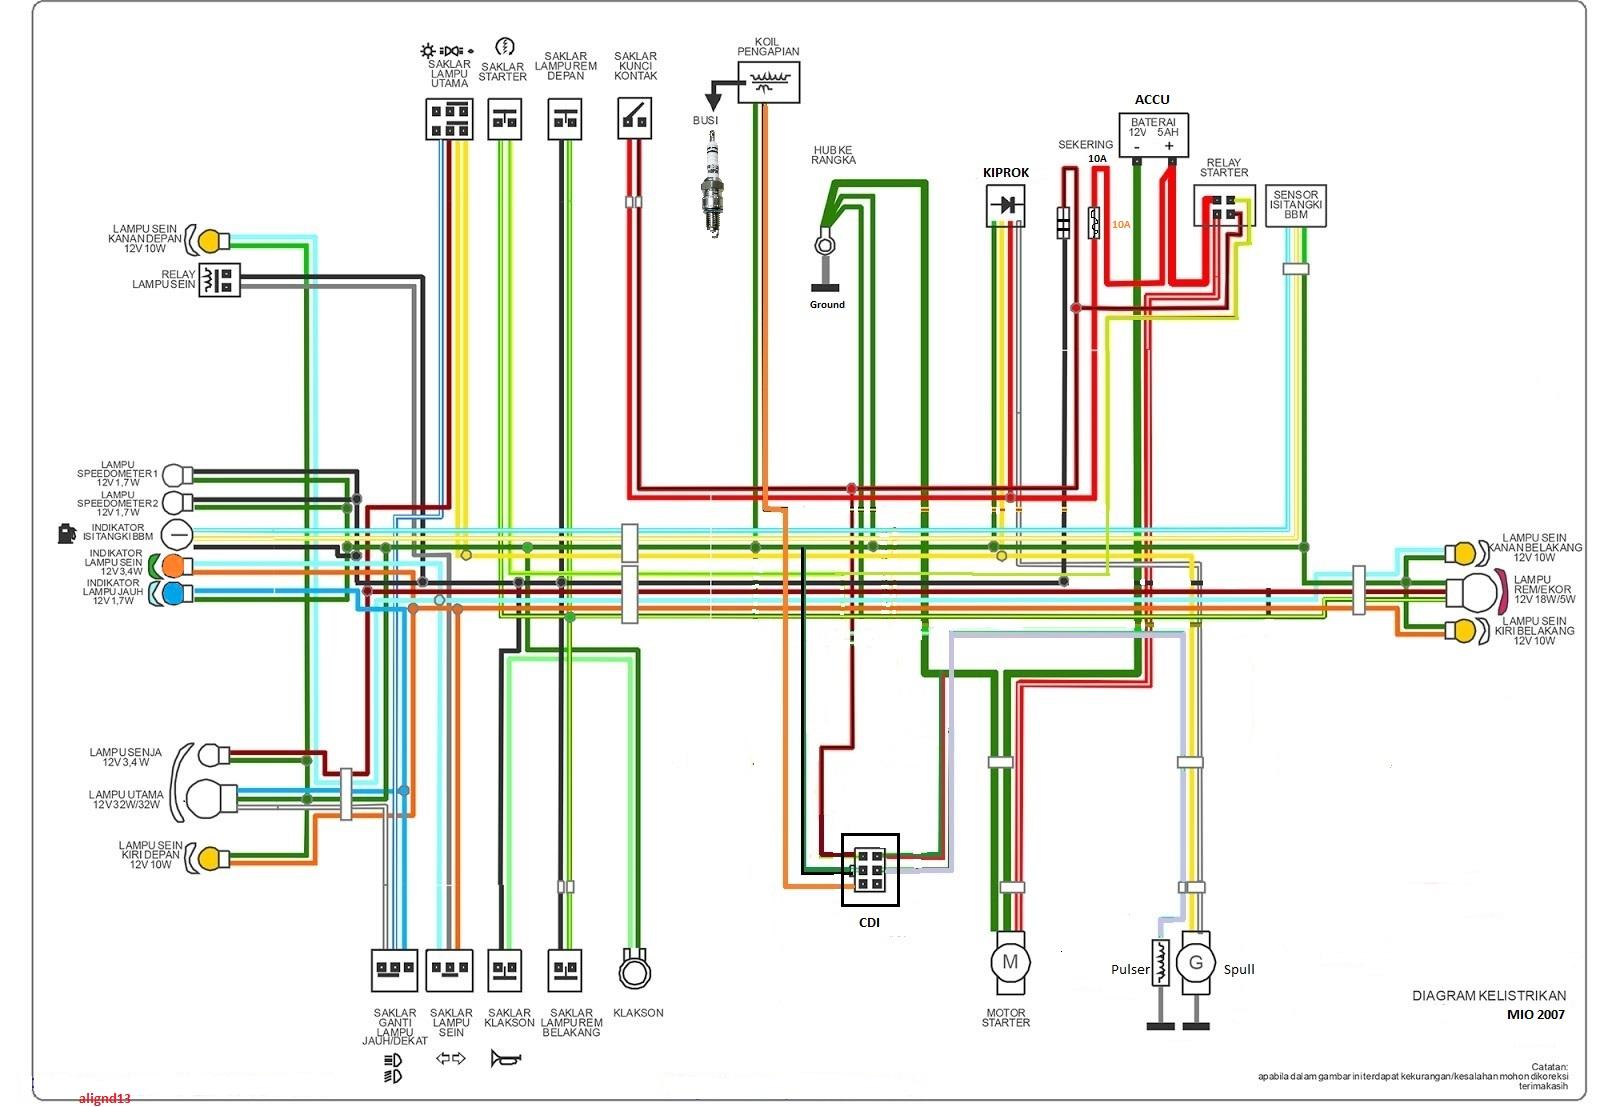 small resolution of diagram kelistrikan mio